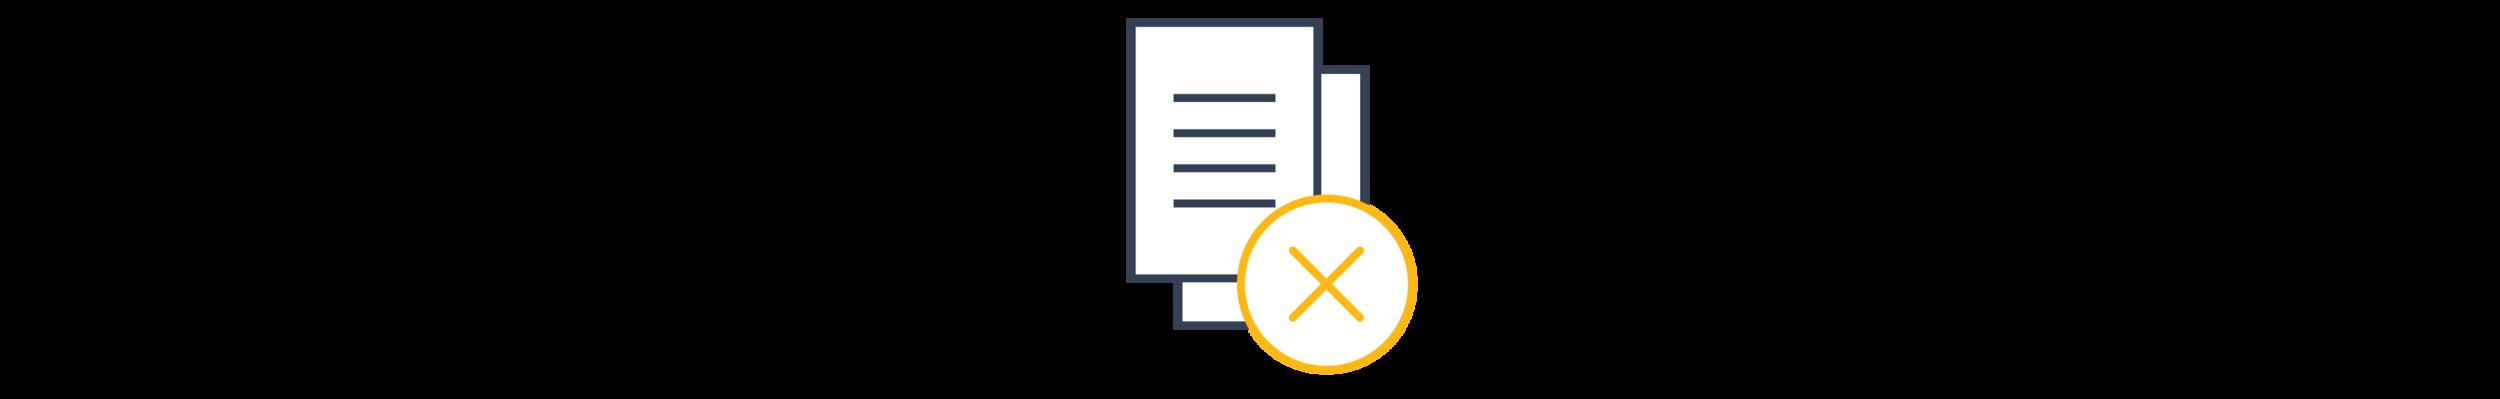 blog_fail-plan-header-01.png